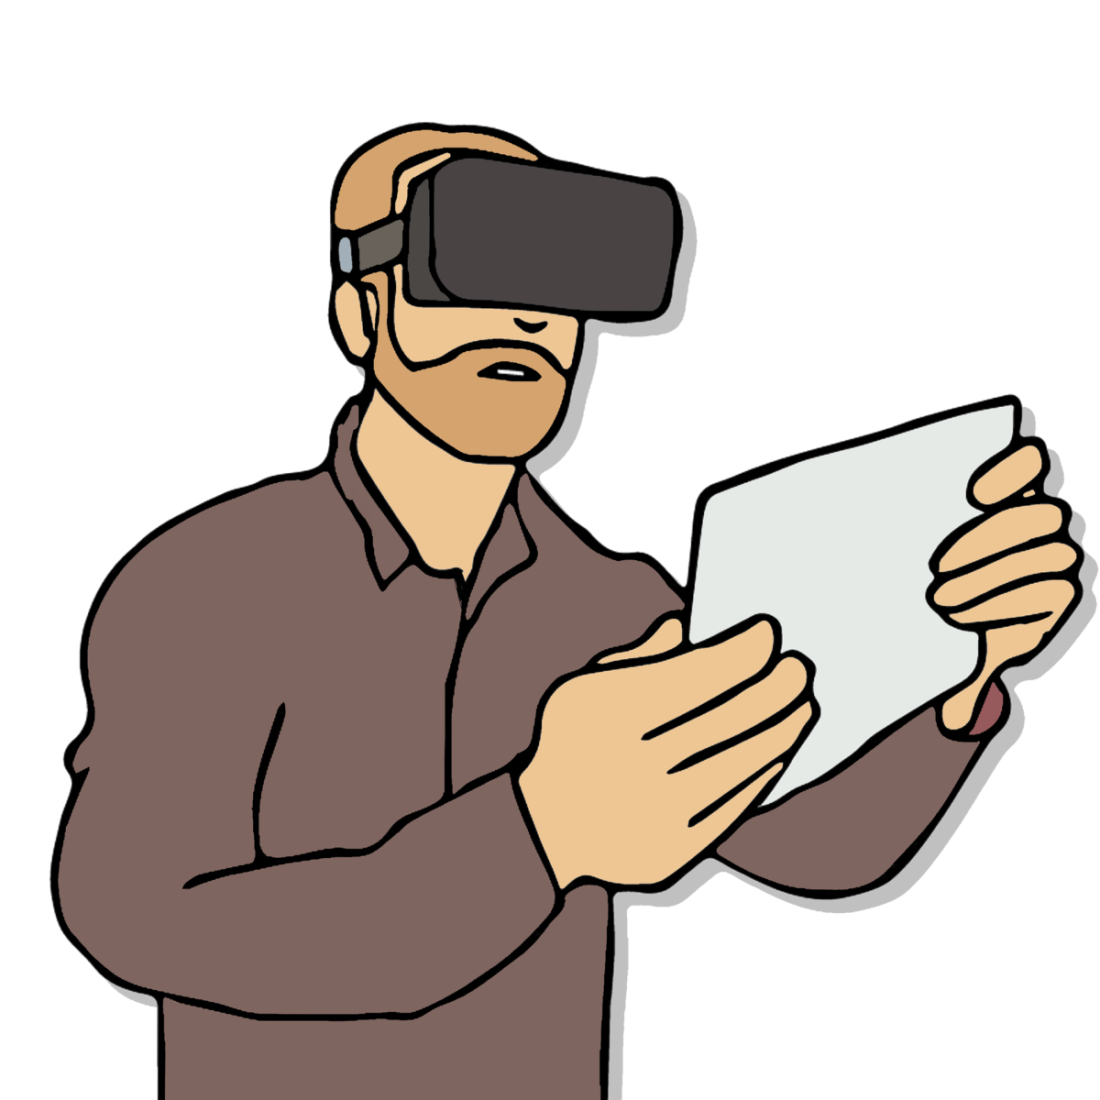 virtual-reality-2320843_1920-1200x1200.png